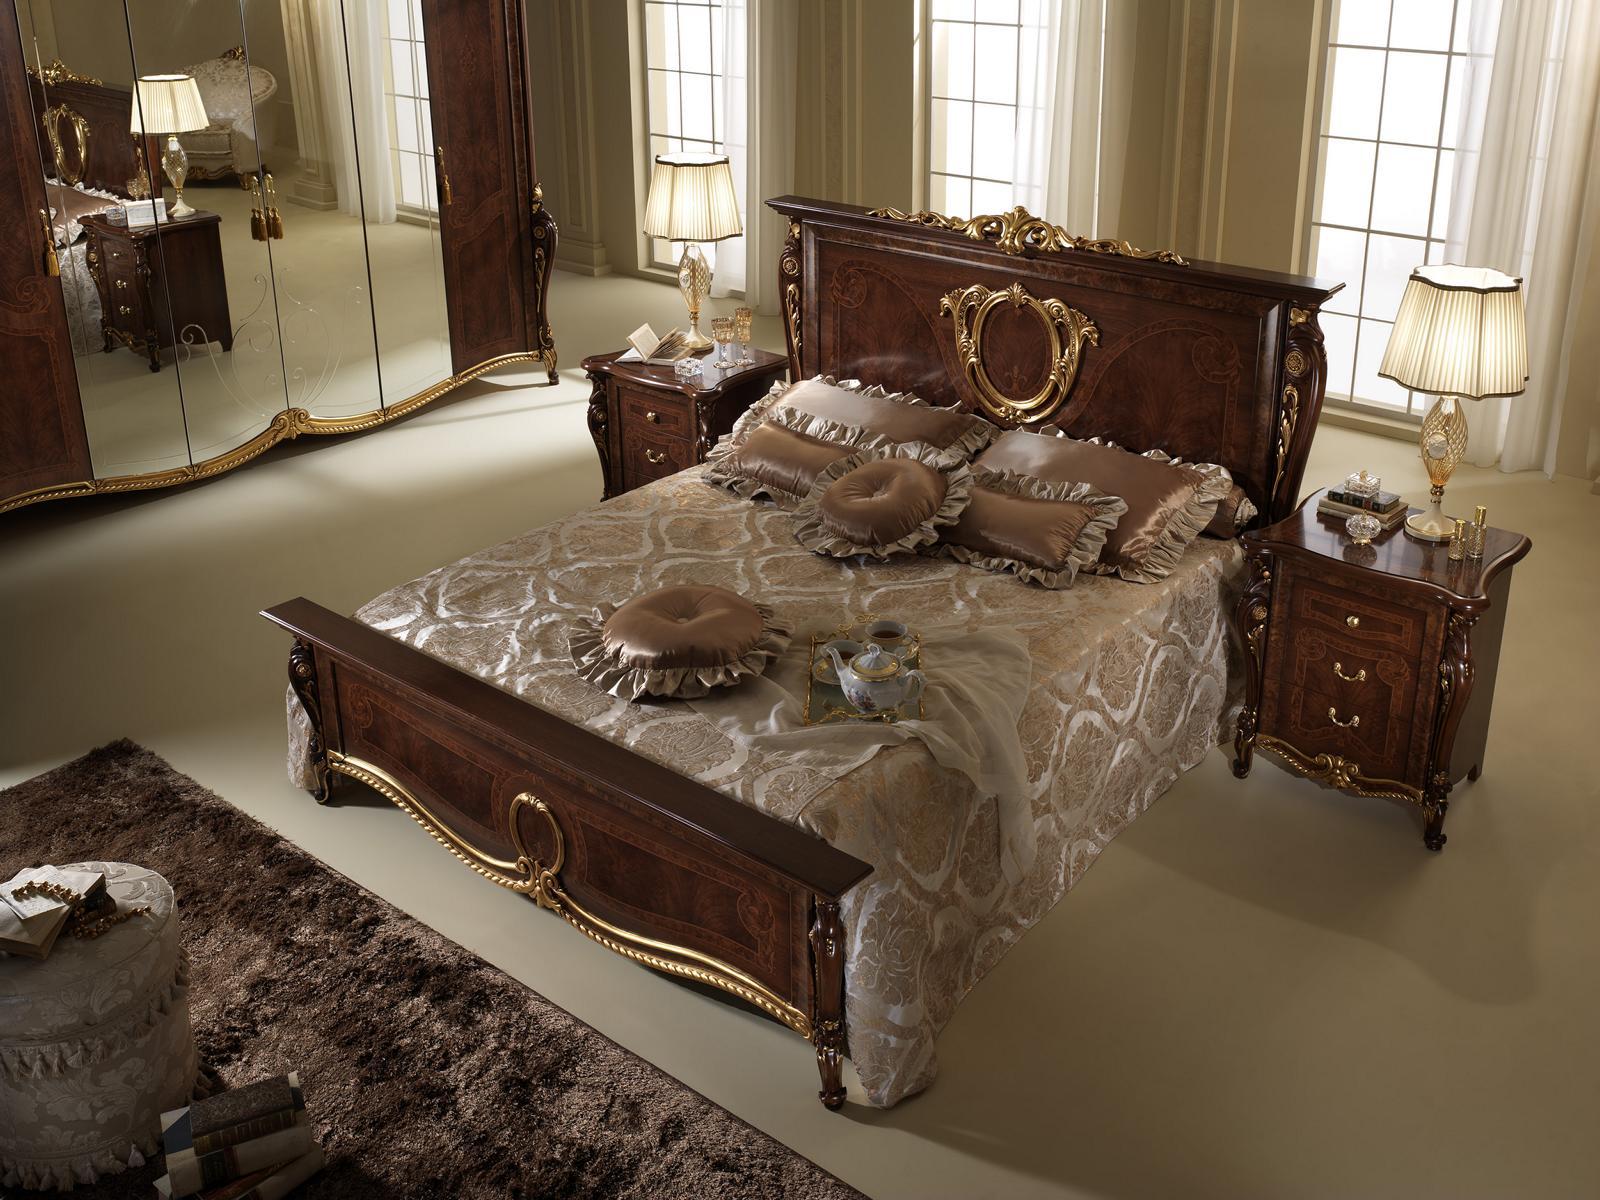 Doppelbett Bett Holz Design Betten Antik Stil Barock Rokoko 2x Nachttische Neu